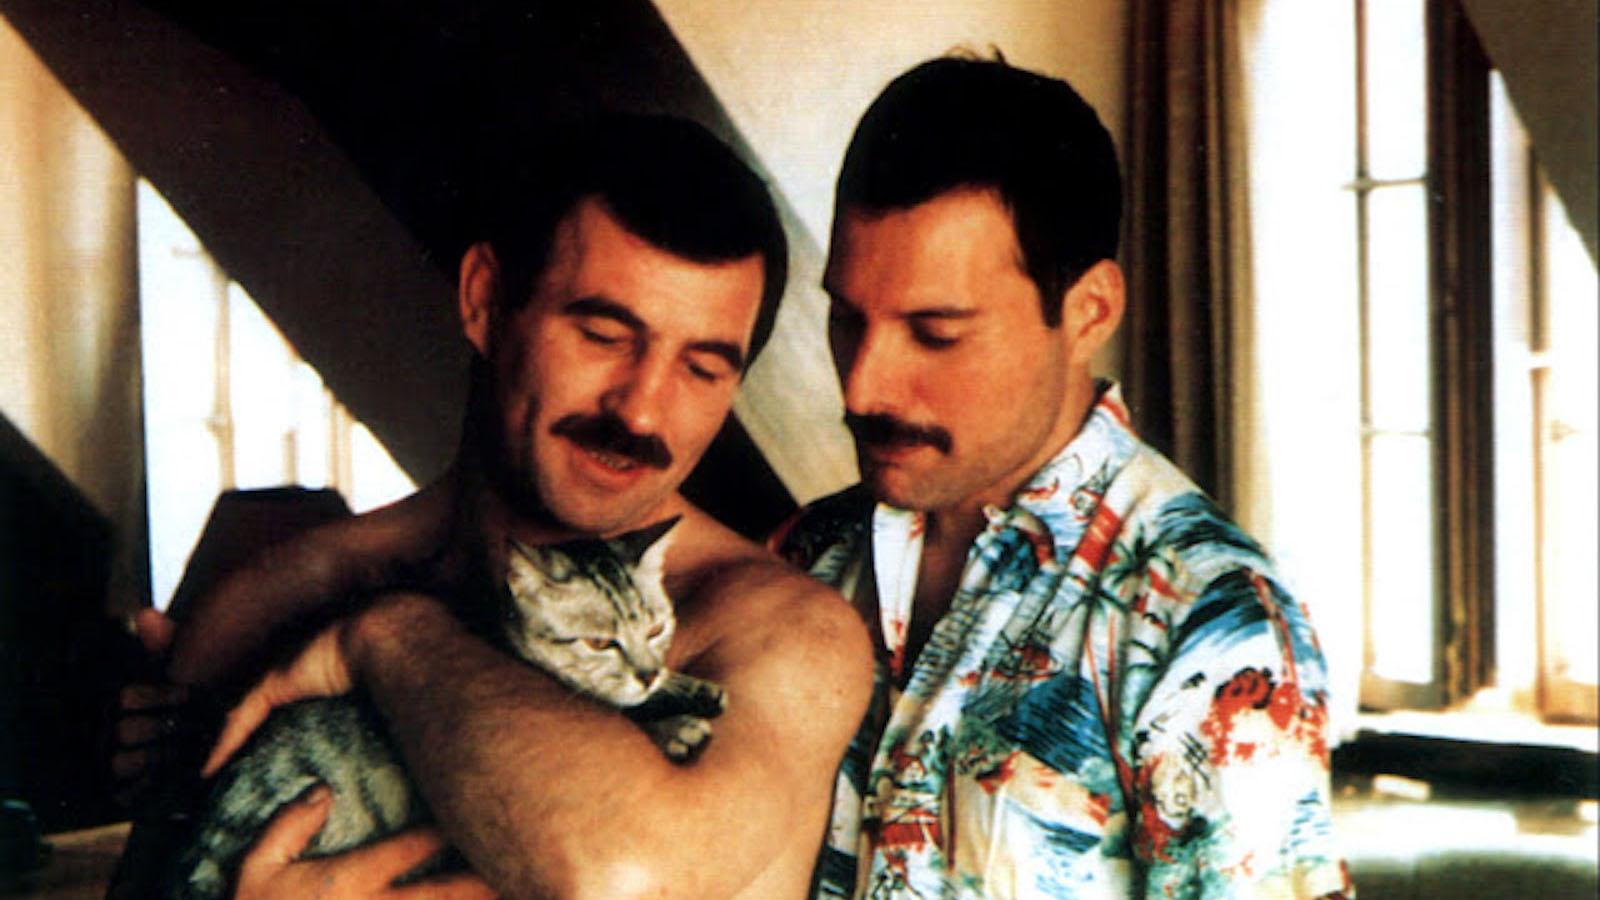 10 Little-Known Facts About Jim Hutton, Freddie Mercury's Longtime Partner